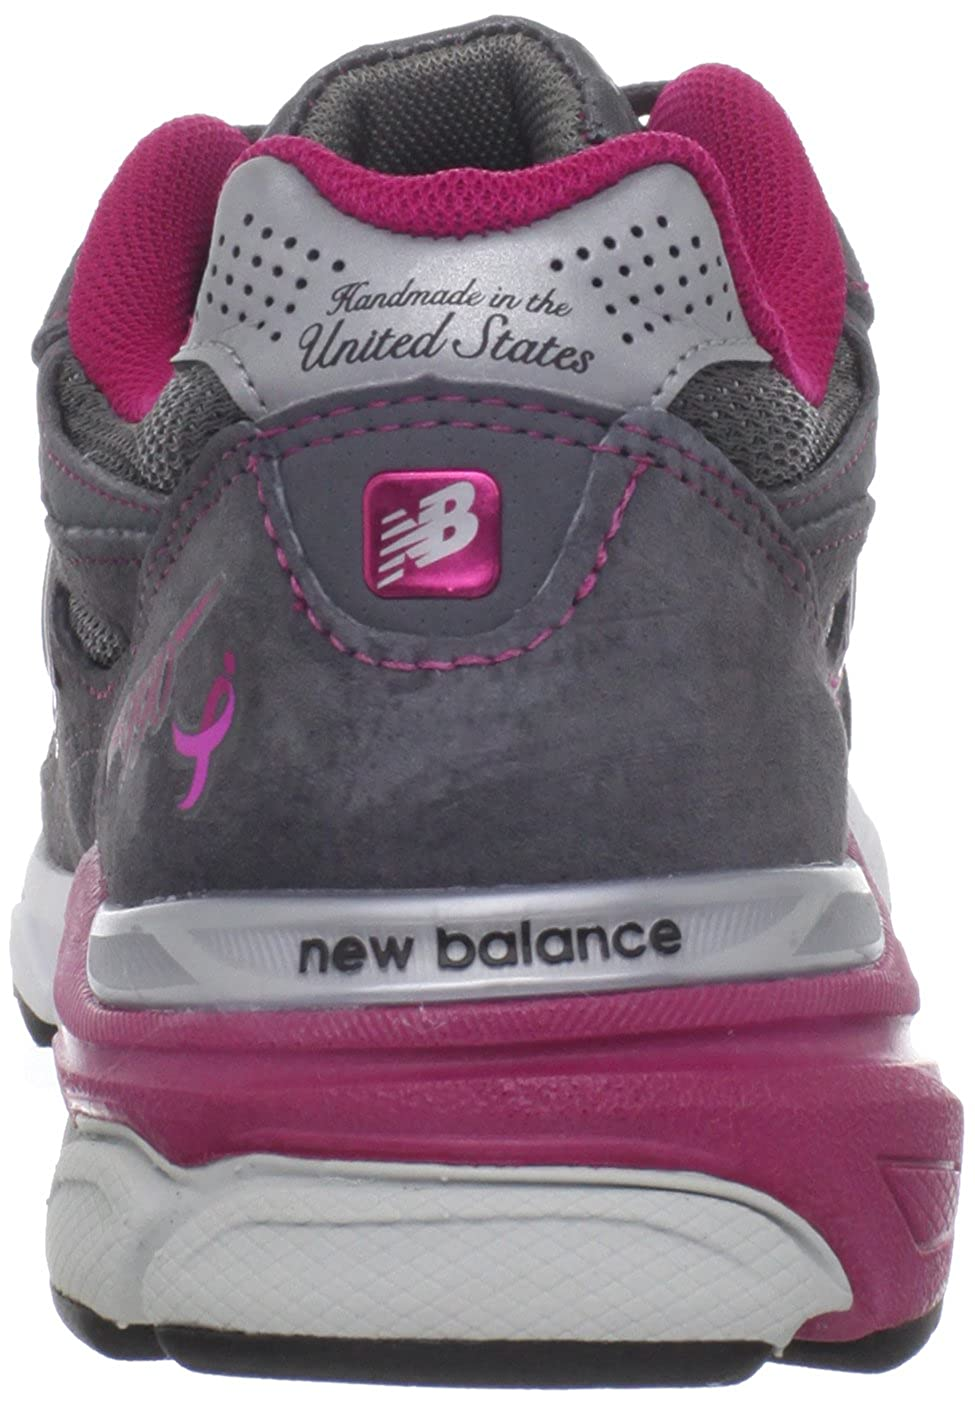 New Balance - - Frauen 990v3 990v3 990v3 Stabilitätslaufschuhe EUR  37.5 EUR - Width B grau with Rosa & Weiß 915c5a